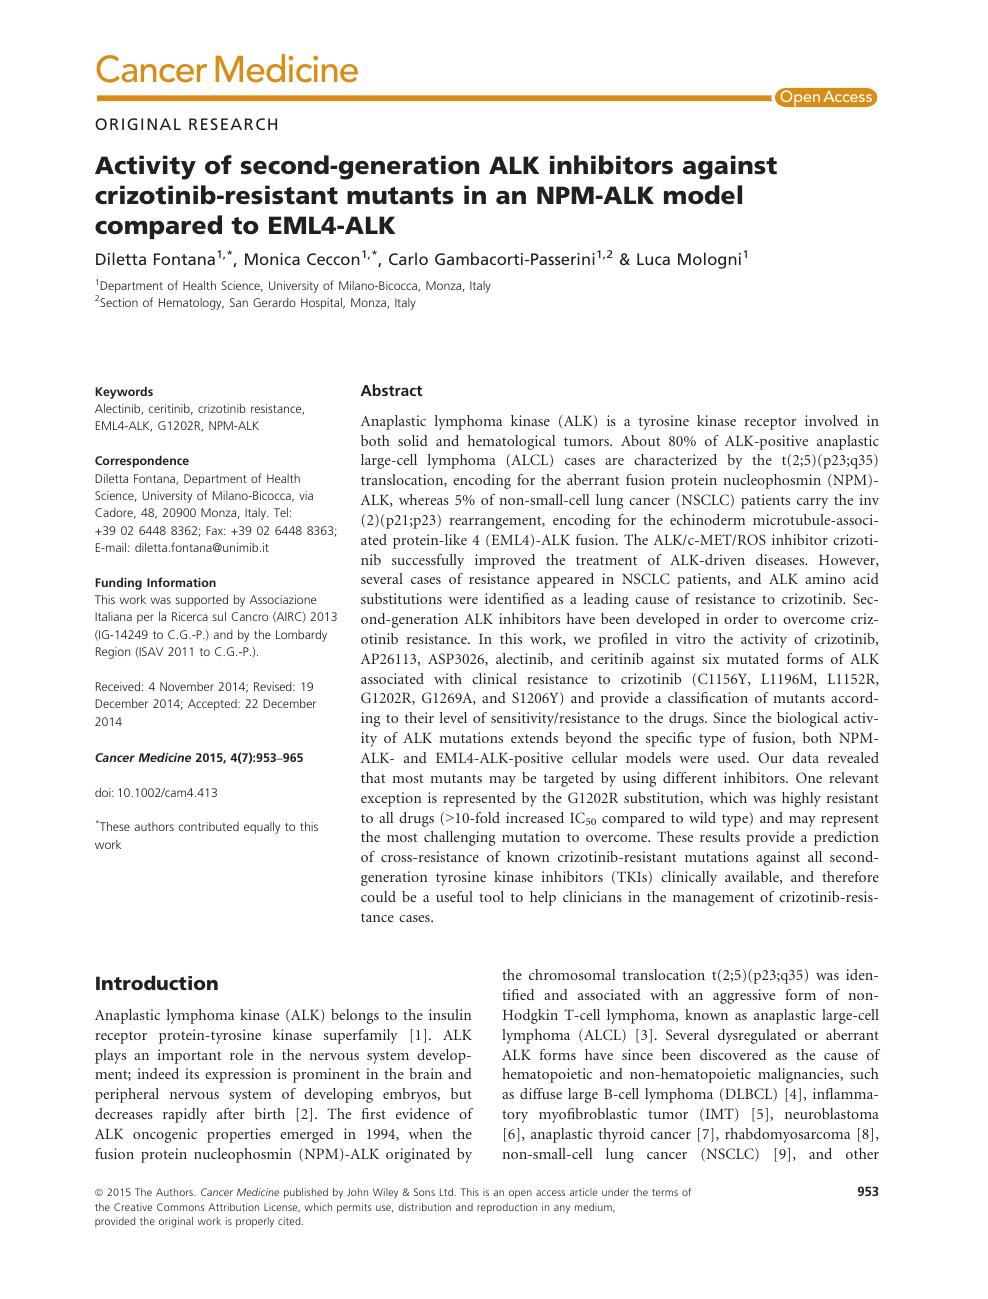 Activity of second-generation ALK inhibitors against